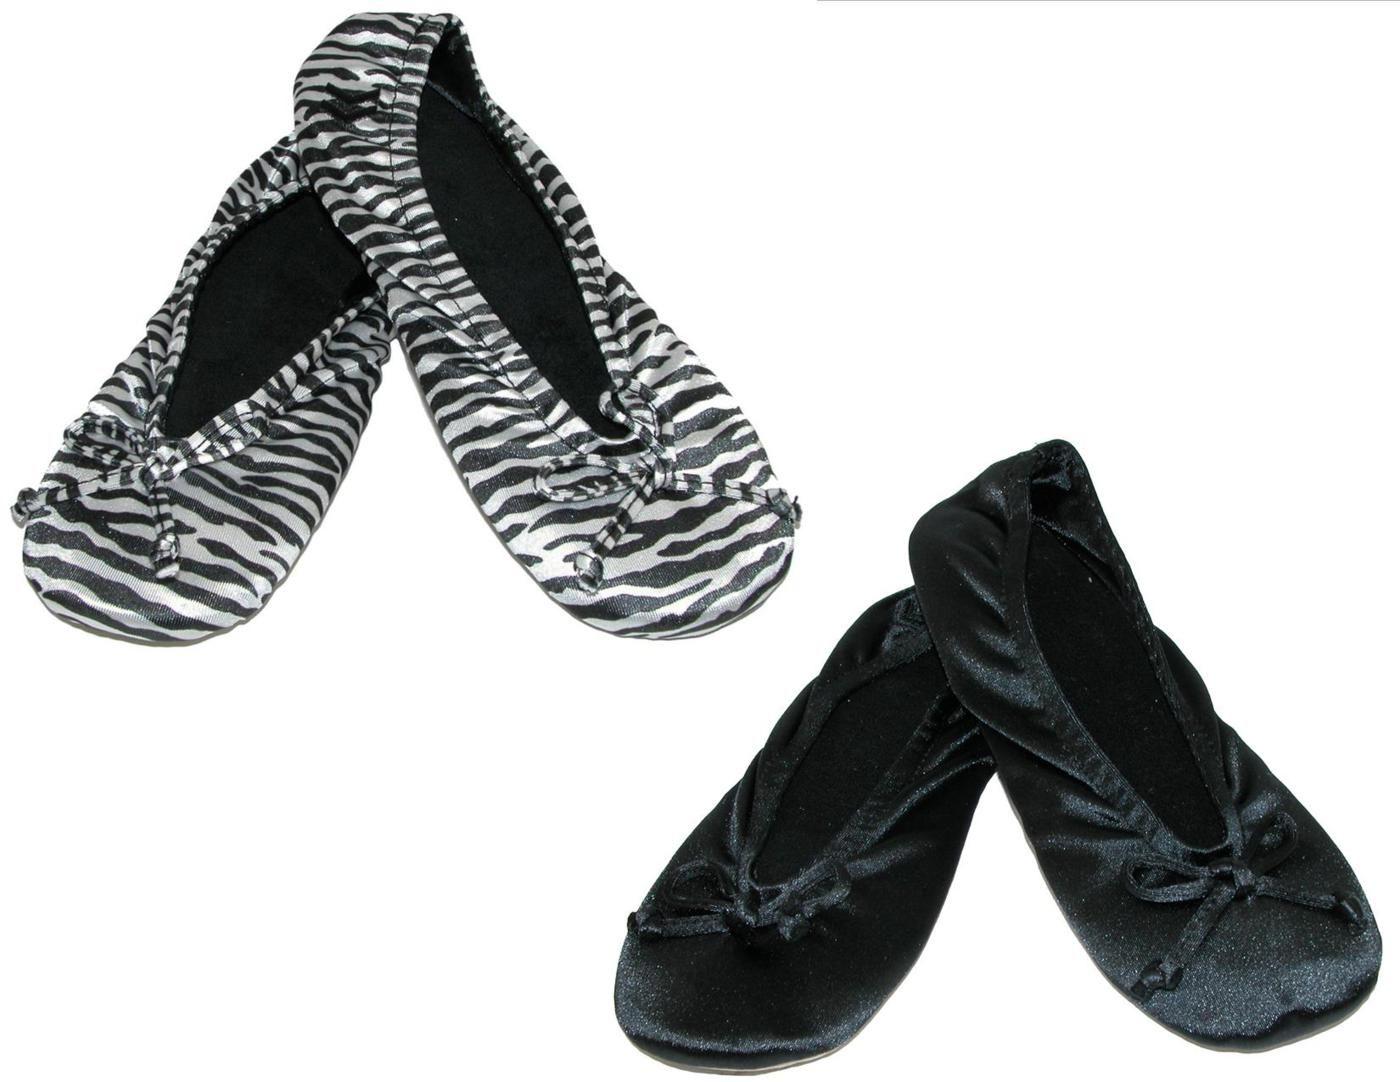 Isotoner Women's Satin Classic Ballerina Slippers (Pack of 2